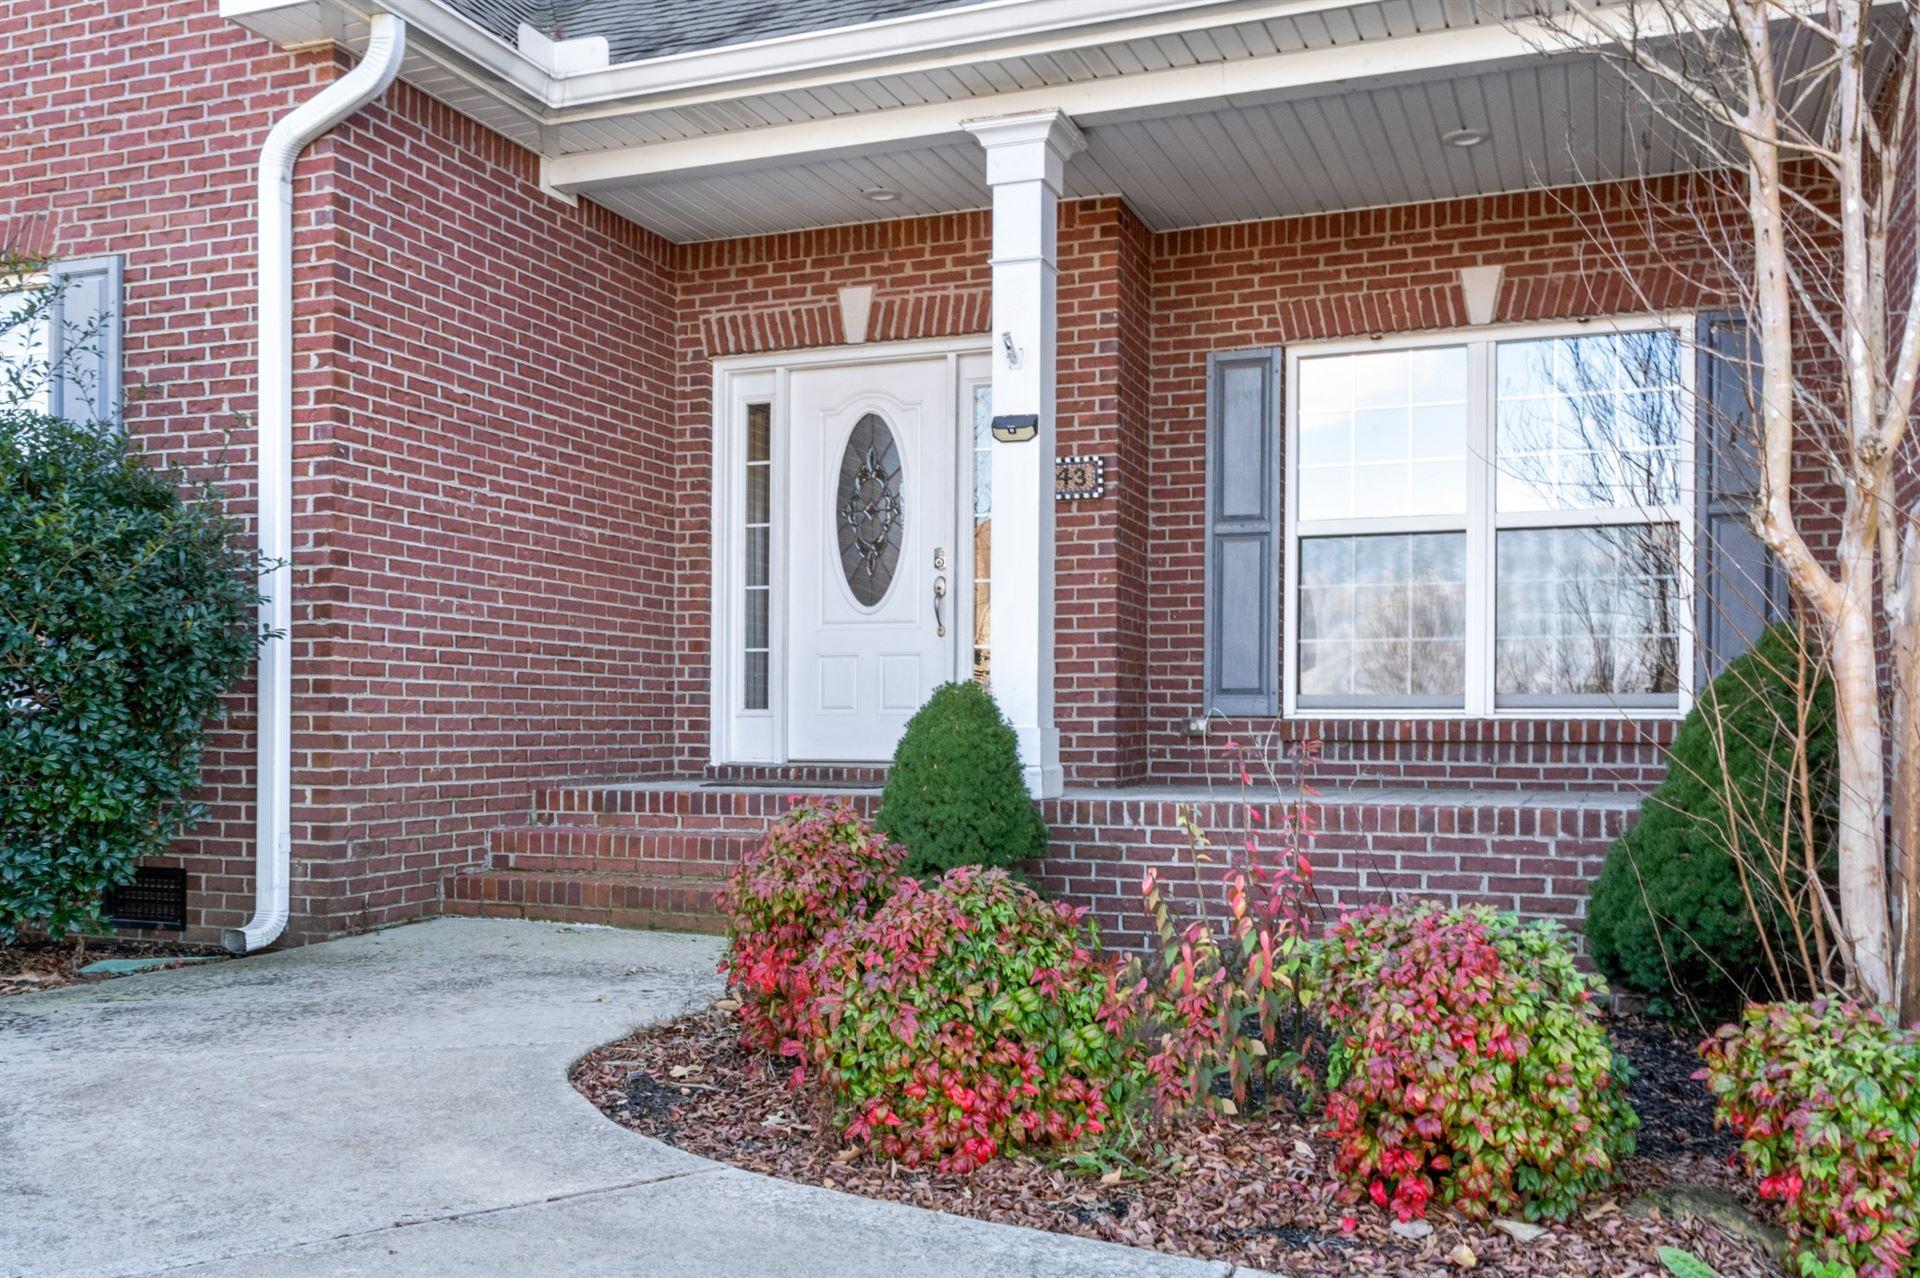 943 Terraceside Cir, Clarksville, TN 37040 - MLS#: 2209421